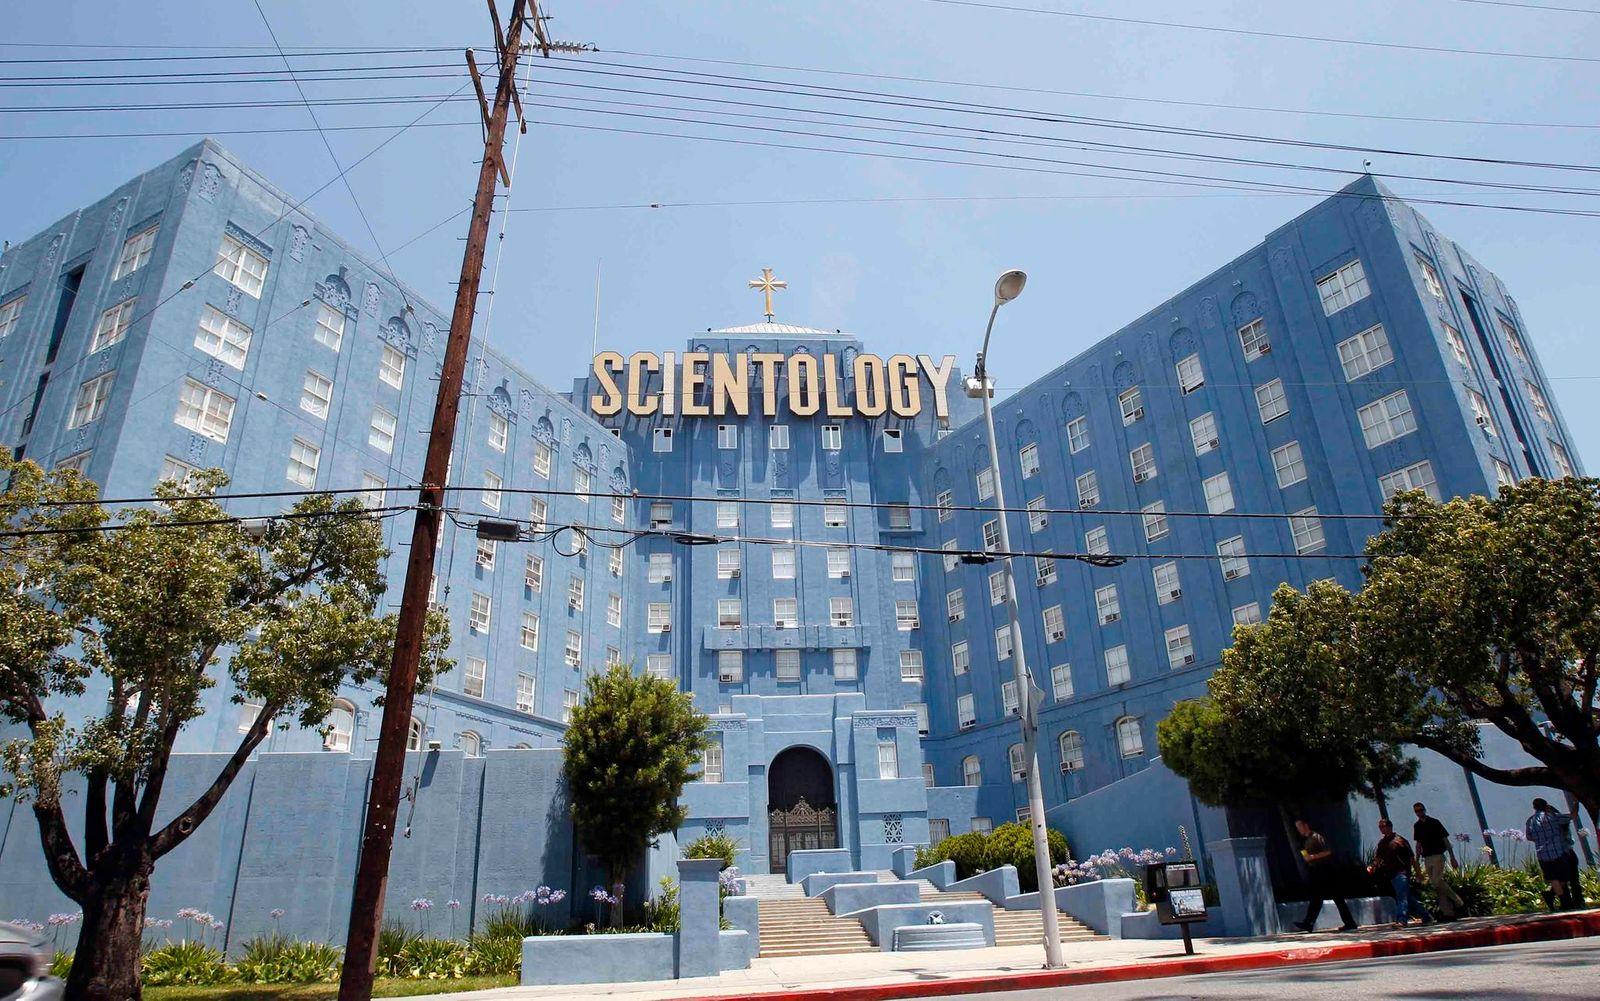 Scientology / Sekte